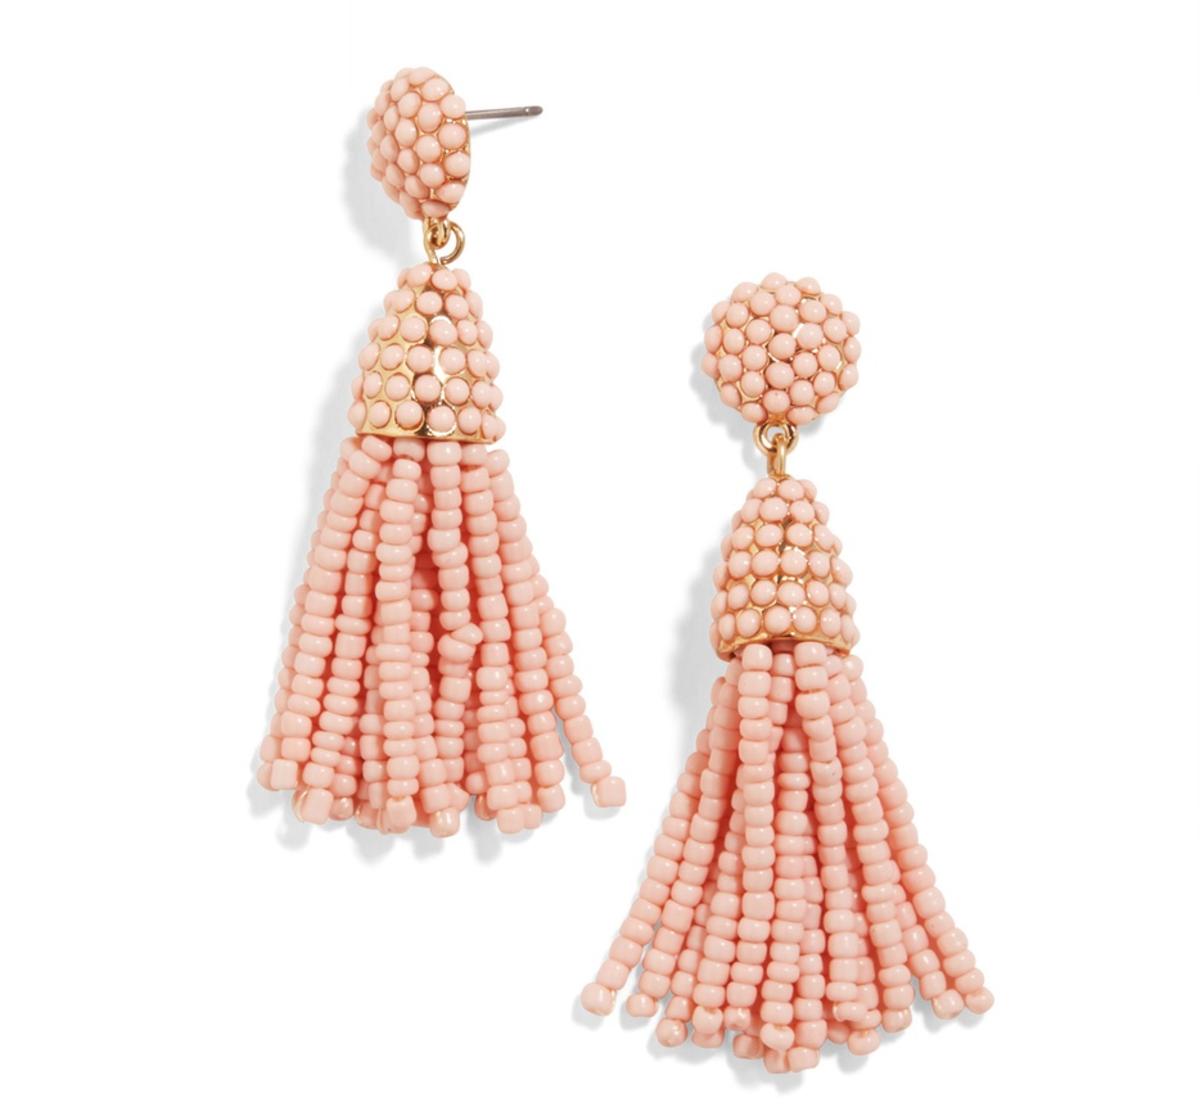 BaubleBar Mini Piñata Tassel Earrings, $32, available at BaubleBar.